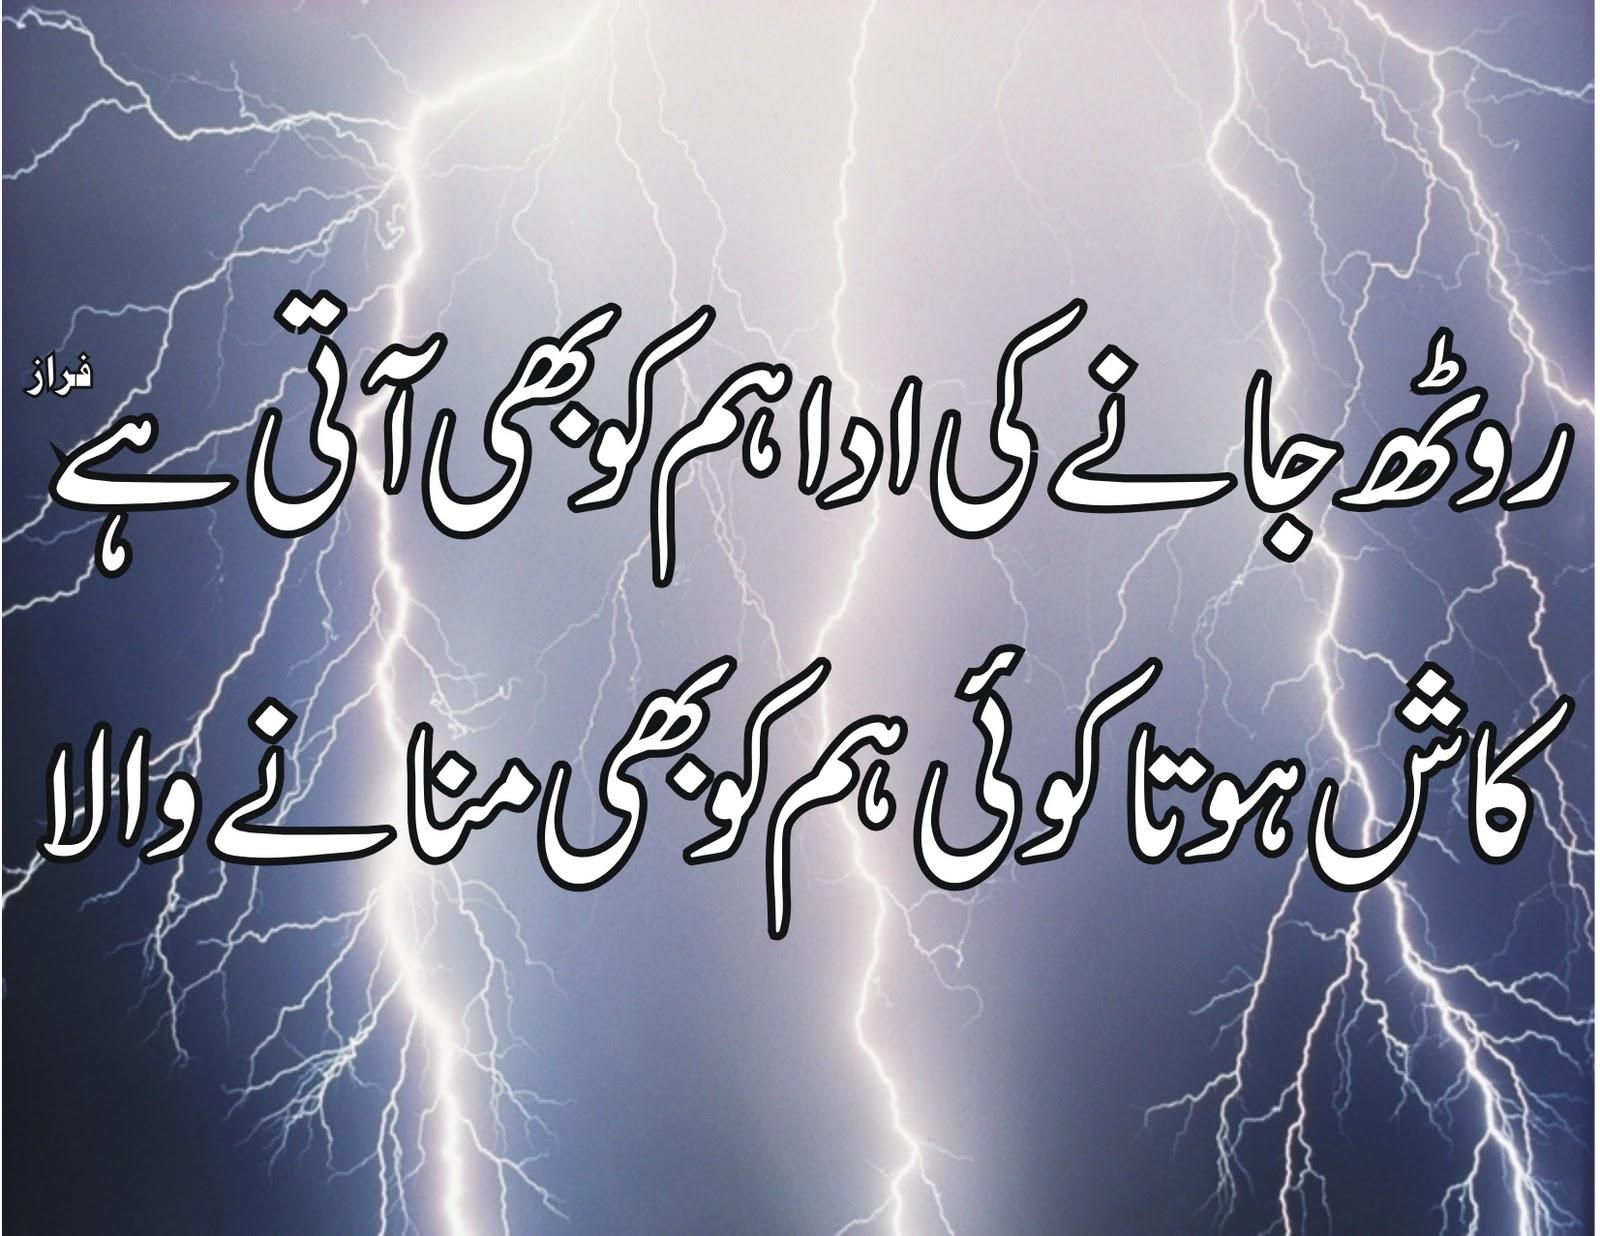 Allama Iqbal Wallpapers Hd Urdu Poetry Sms Sad Love Pic Wallpaper Ahmed Faraz Wasi